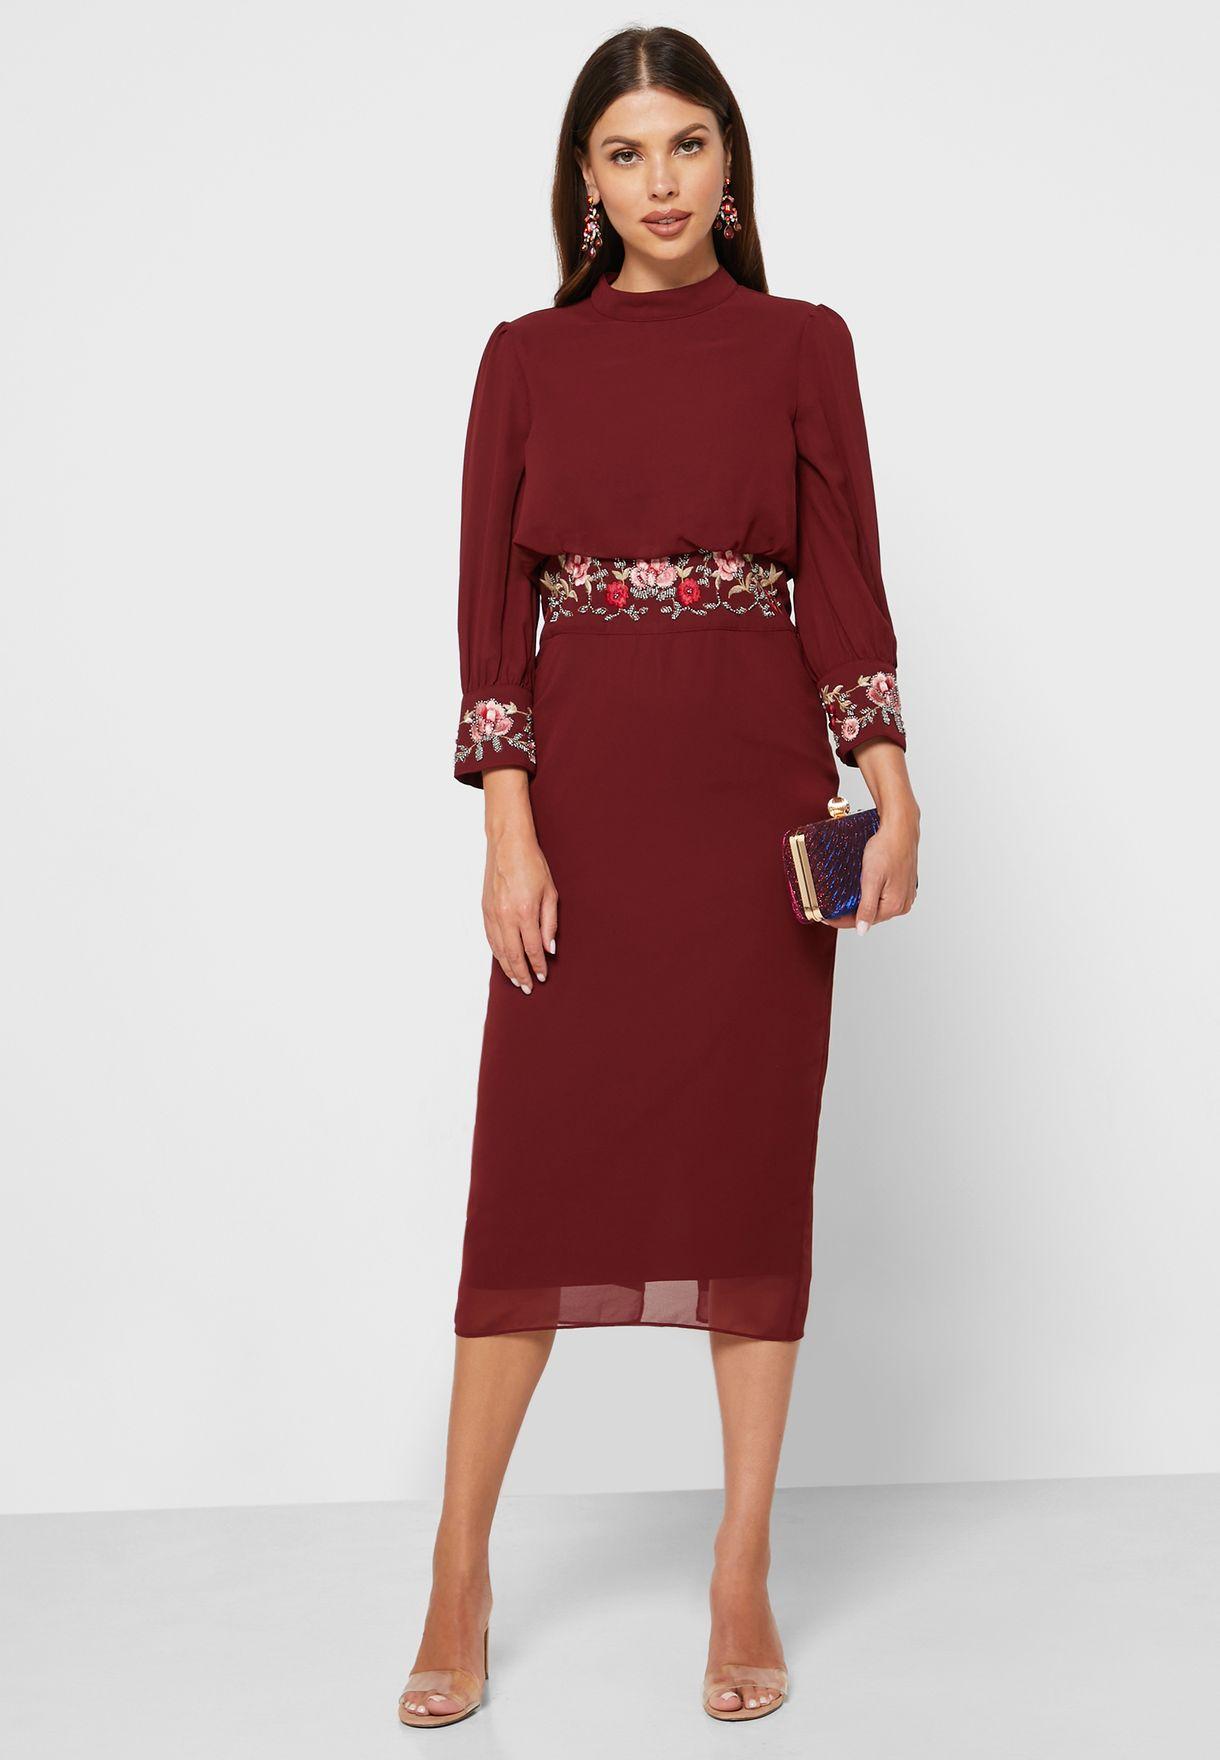 فستان مزين بتطريز